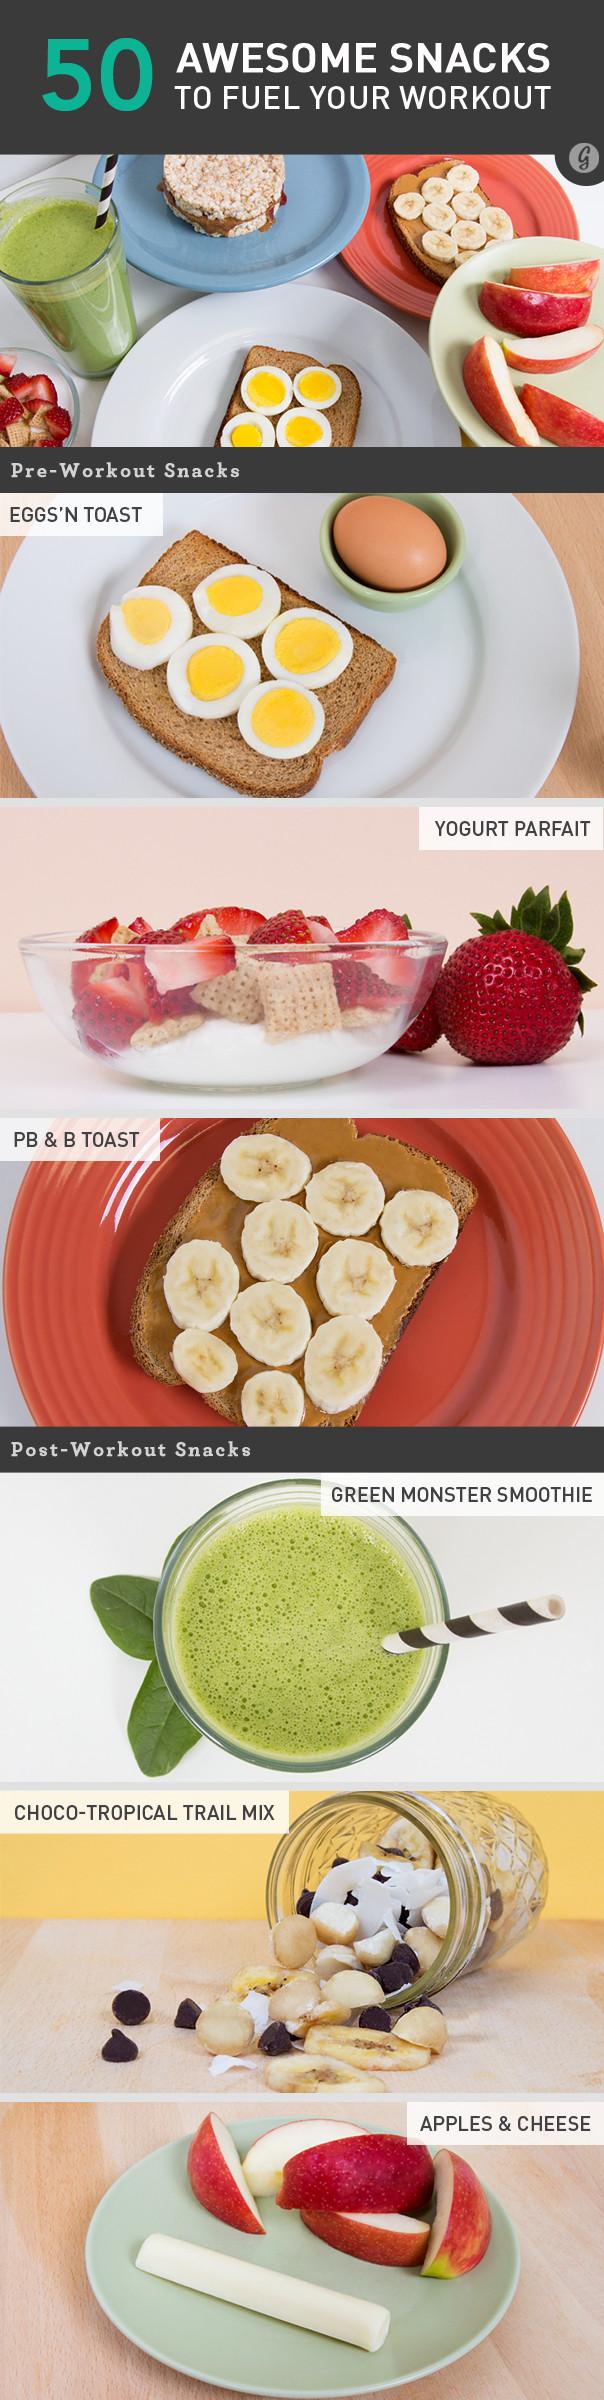 Healthy Pre Workout Snacks  ea9f4616d67ddba252d11cf97b4b16f4